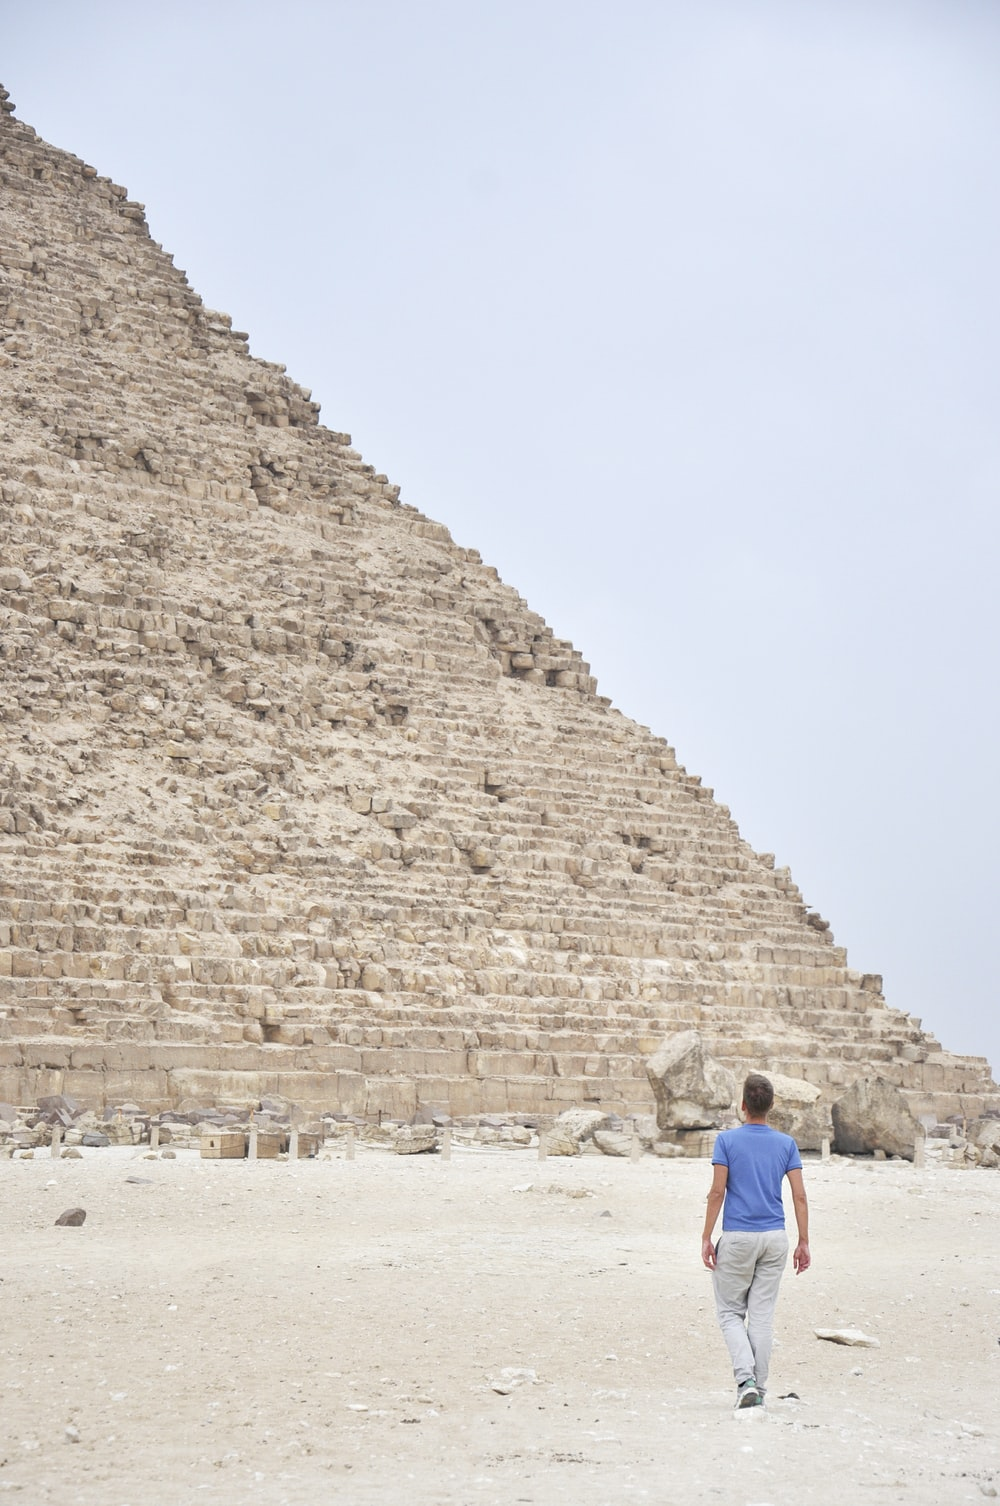 man standing near pyramid during daytime